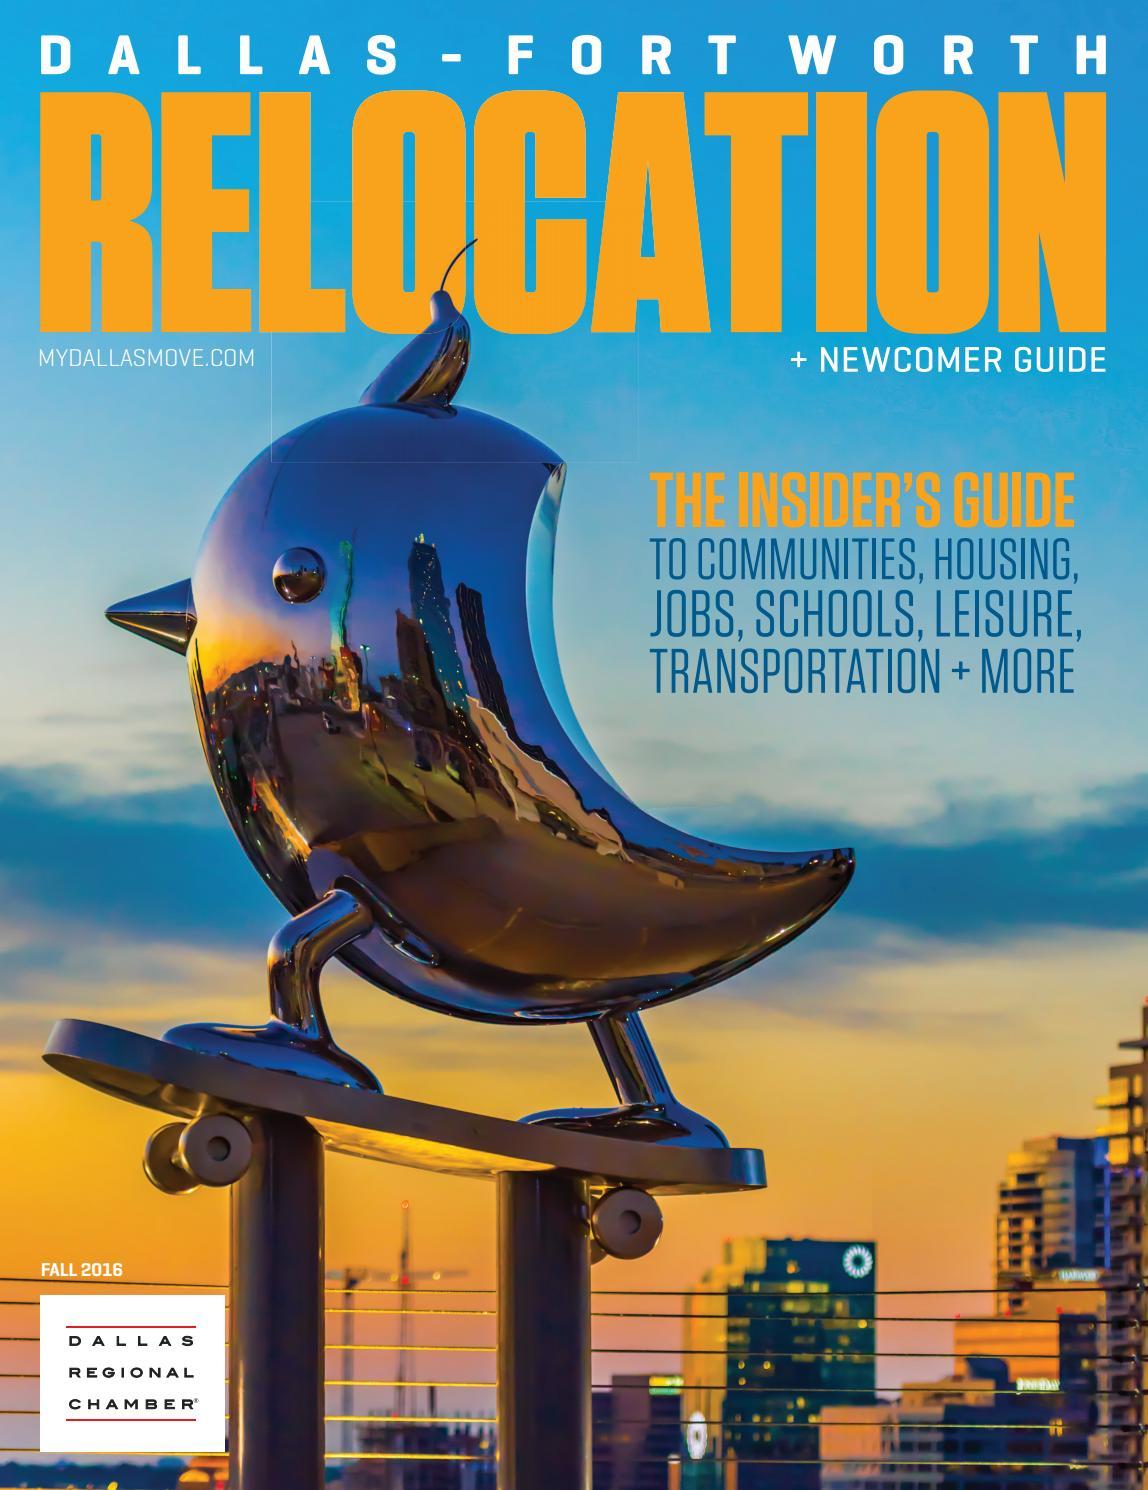 Dallas fort worth relocation fall 2016 by dallas regional chamber publications issuu